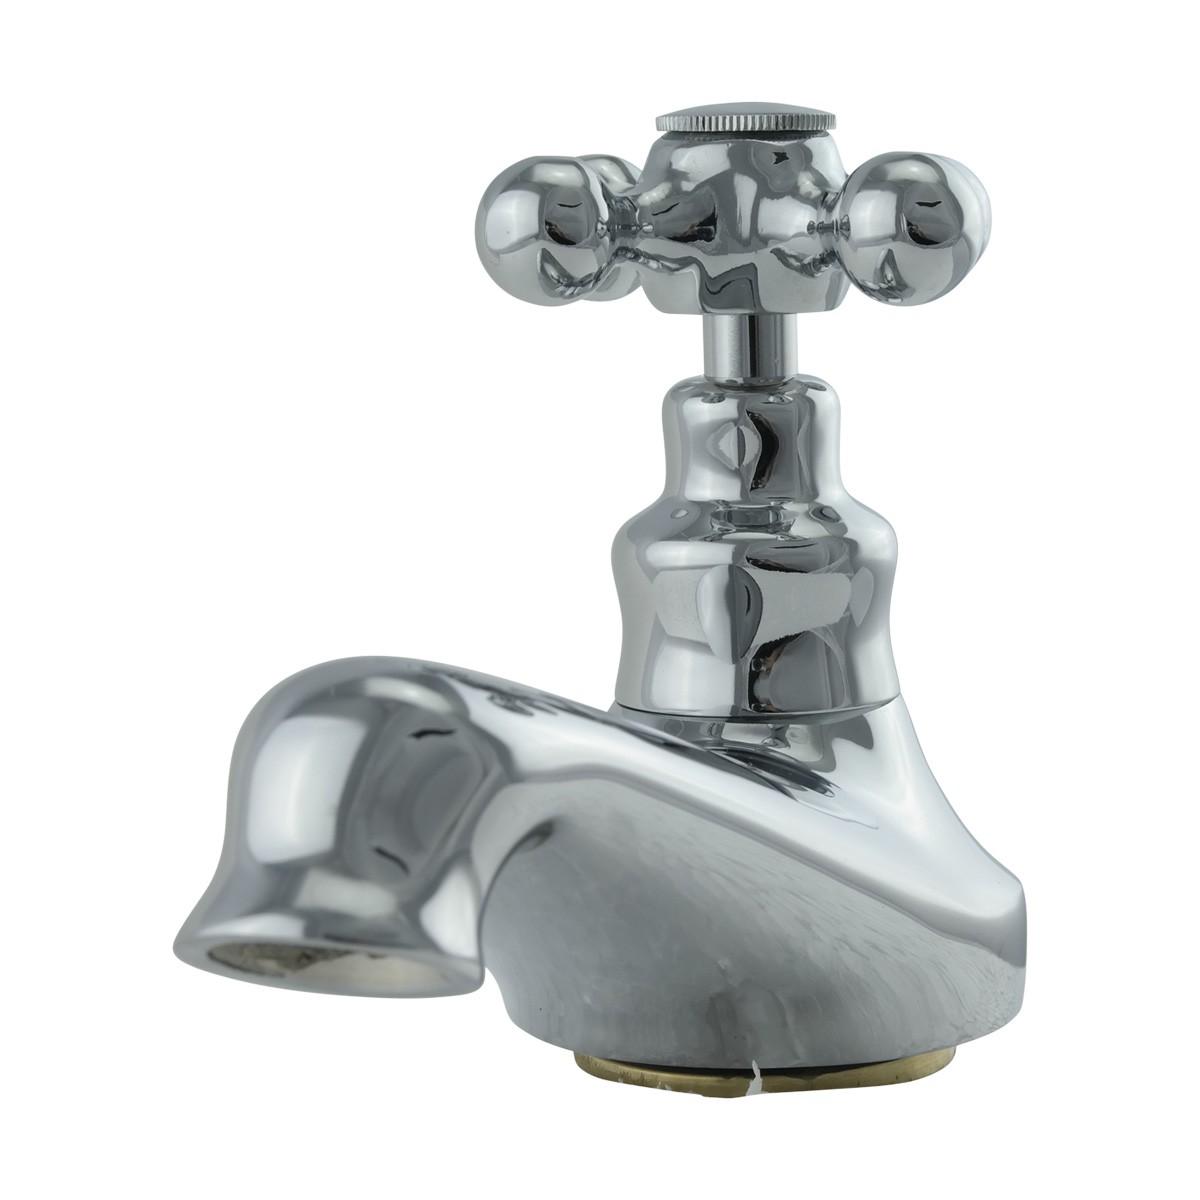 Bathroom Single Tap Faucet Chrome Pair 2 Handles Widespread Single Tap Faucets Bathroom Hot and Cold Faucets Bathroom Sink Widespread Faucet